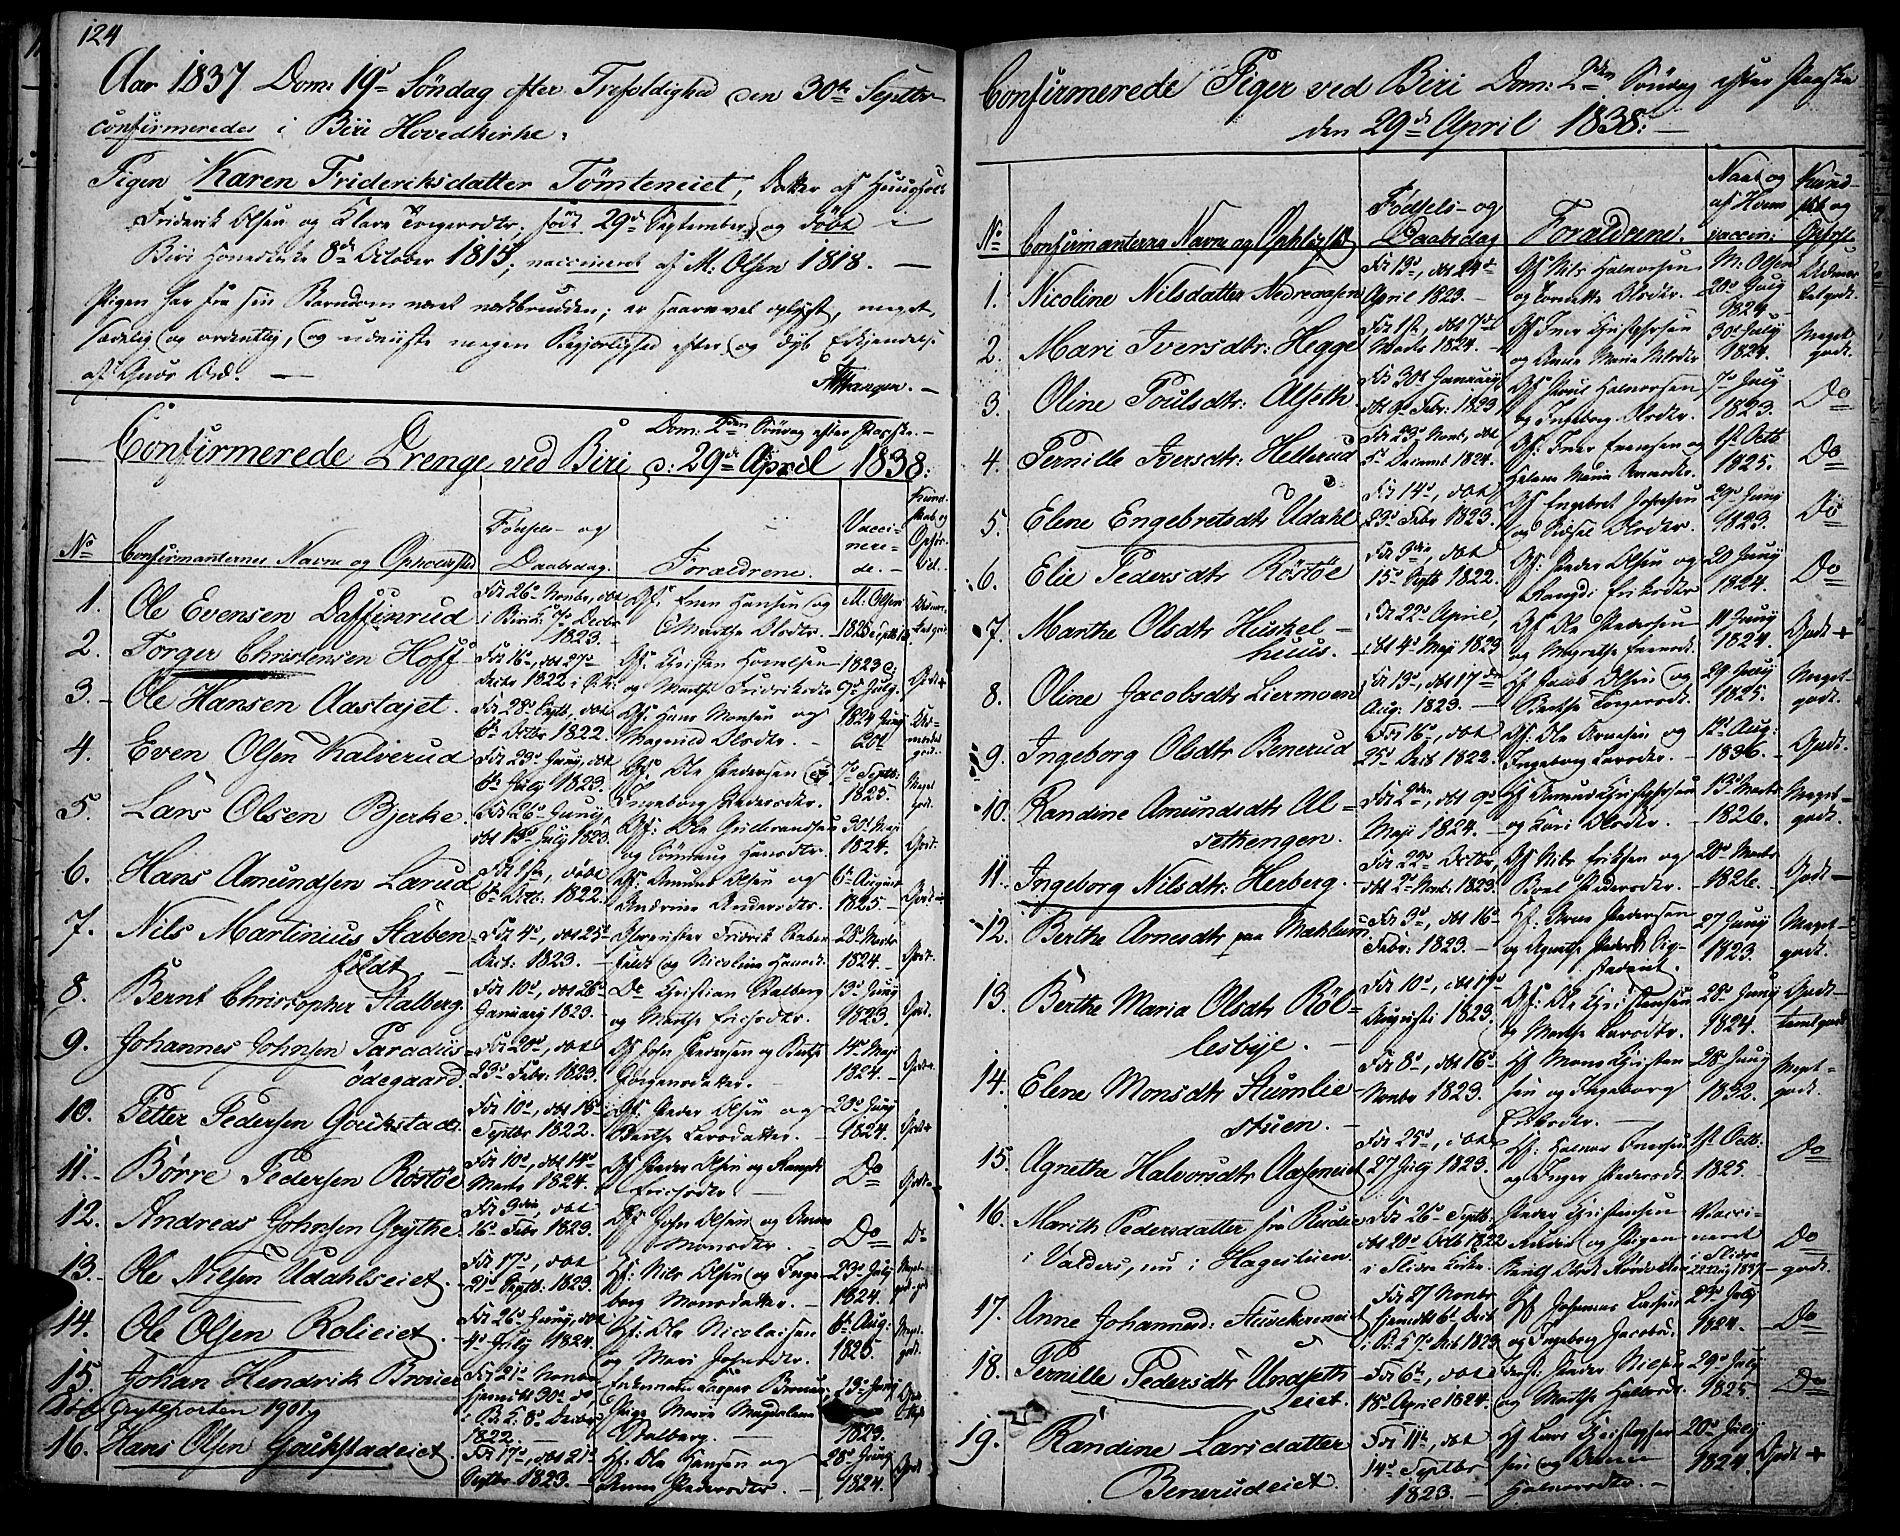 SAH, Biri prestekontor, Ministerialbok nr. 4, 1829-1842, s. 124